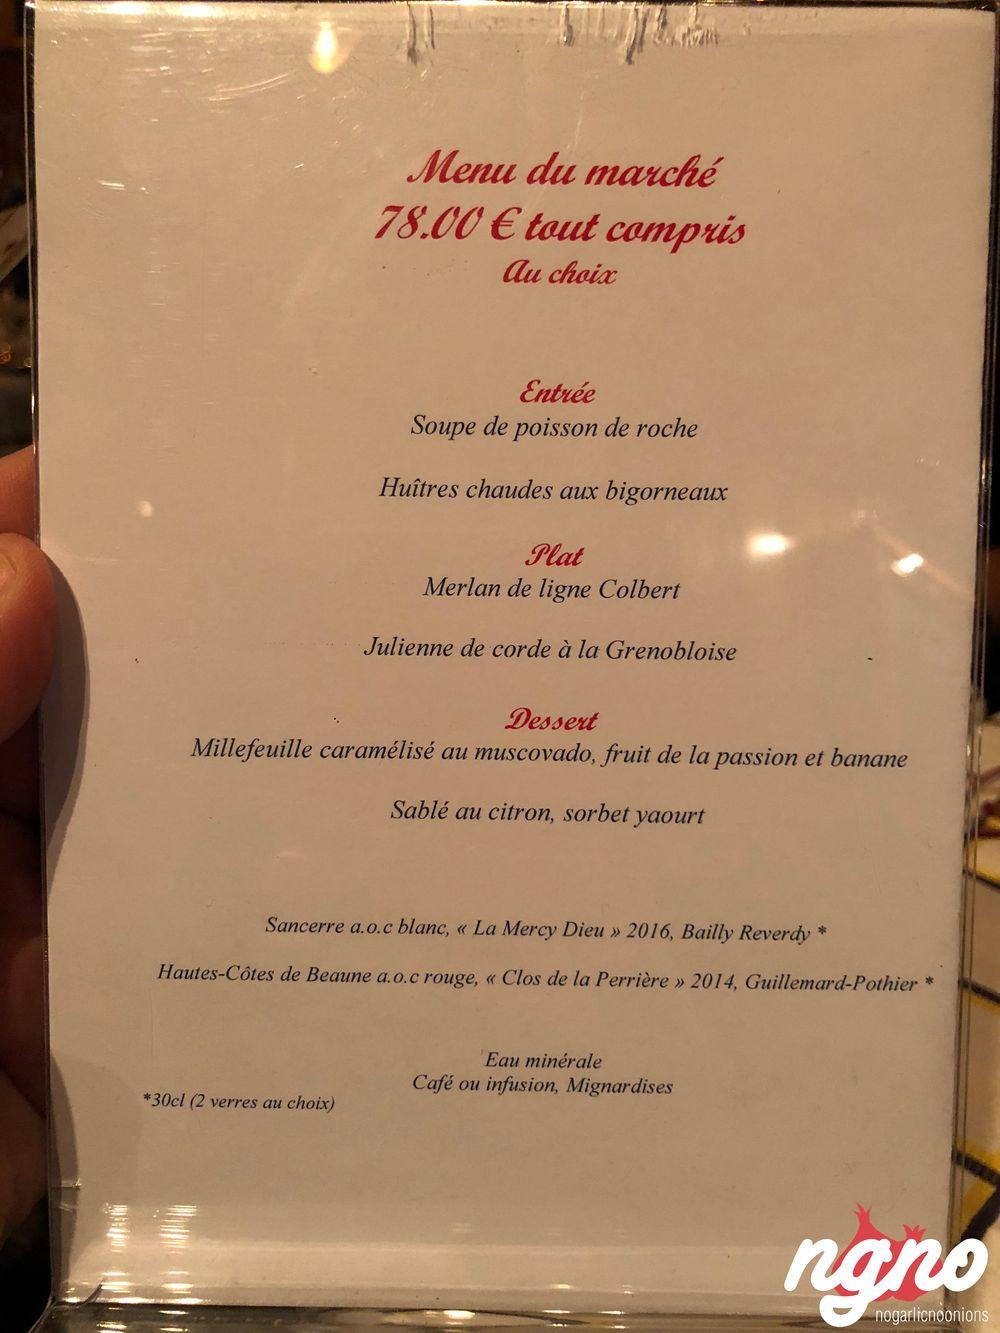 marius et jeanette: an upscale seafood restaurant in paris